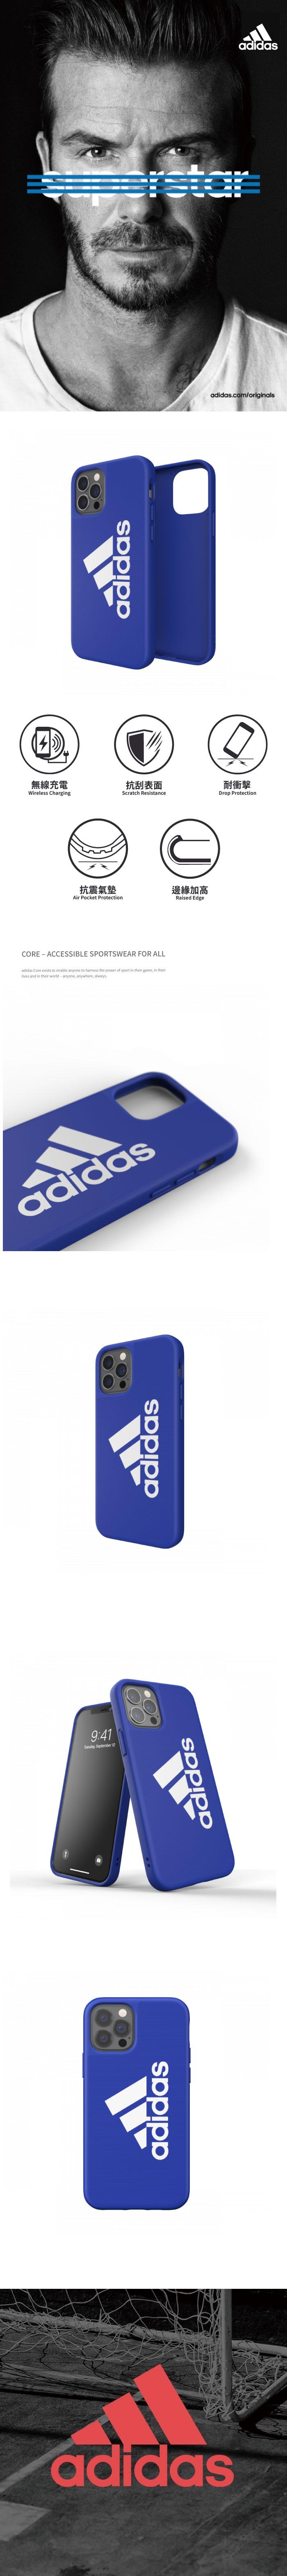 Adidas|iPhone 12 Pro Max 手機殼 Sport 經典標誌 藍色